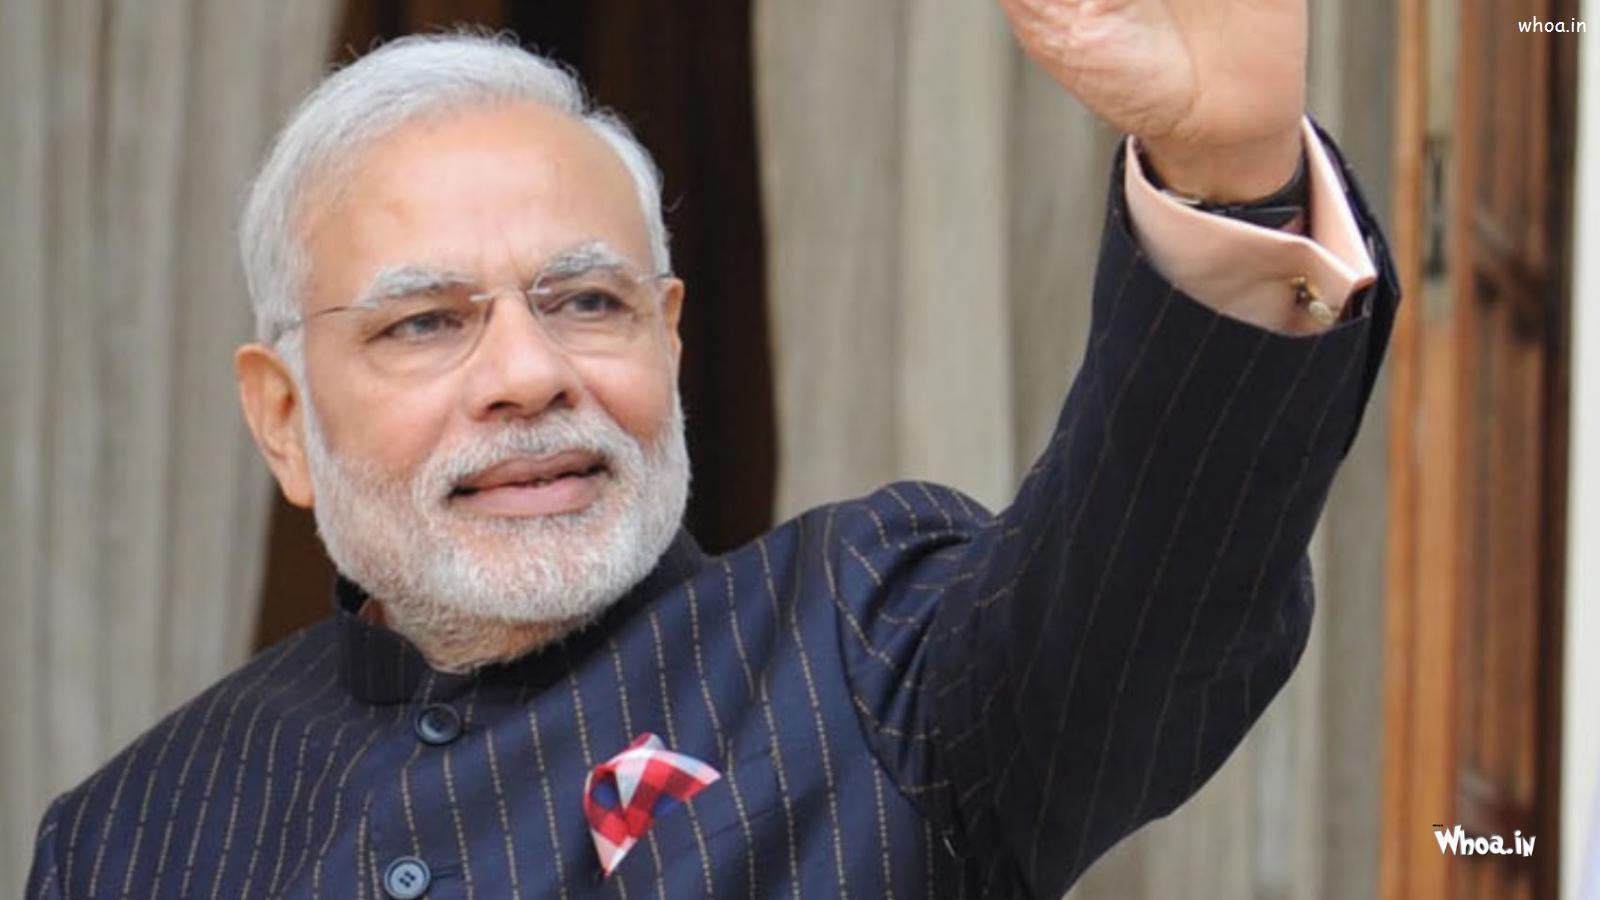 Indian Prime Minister Narendra Modi Black Suit HD Wallpaper